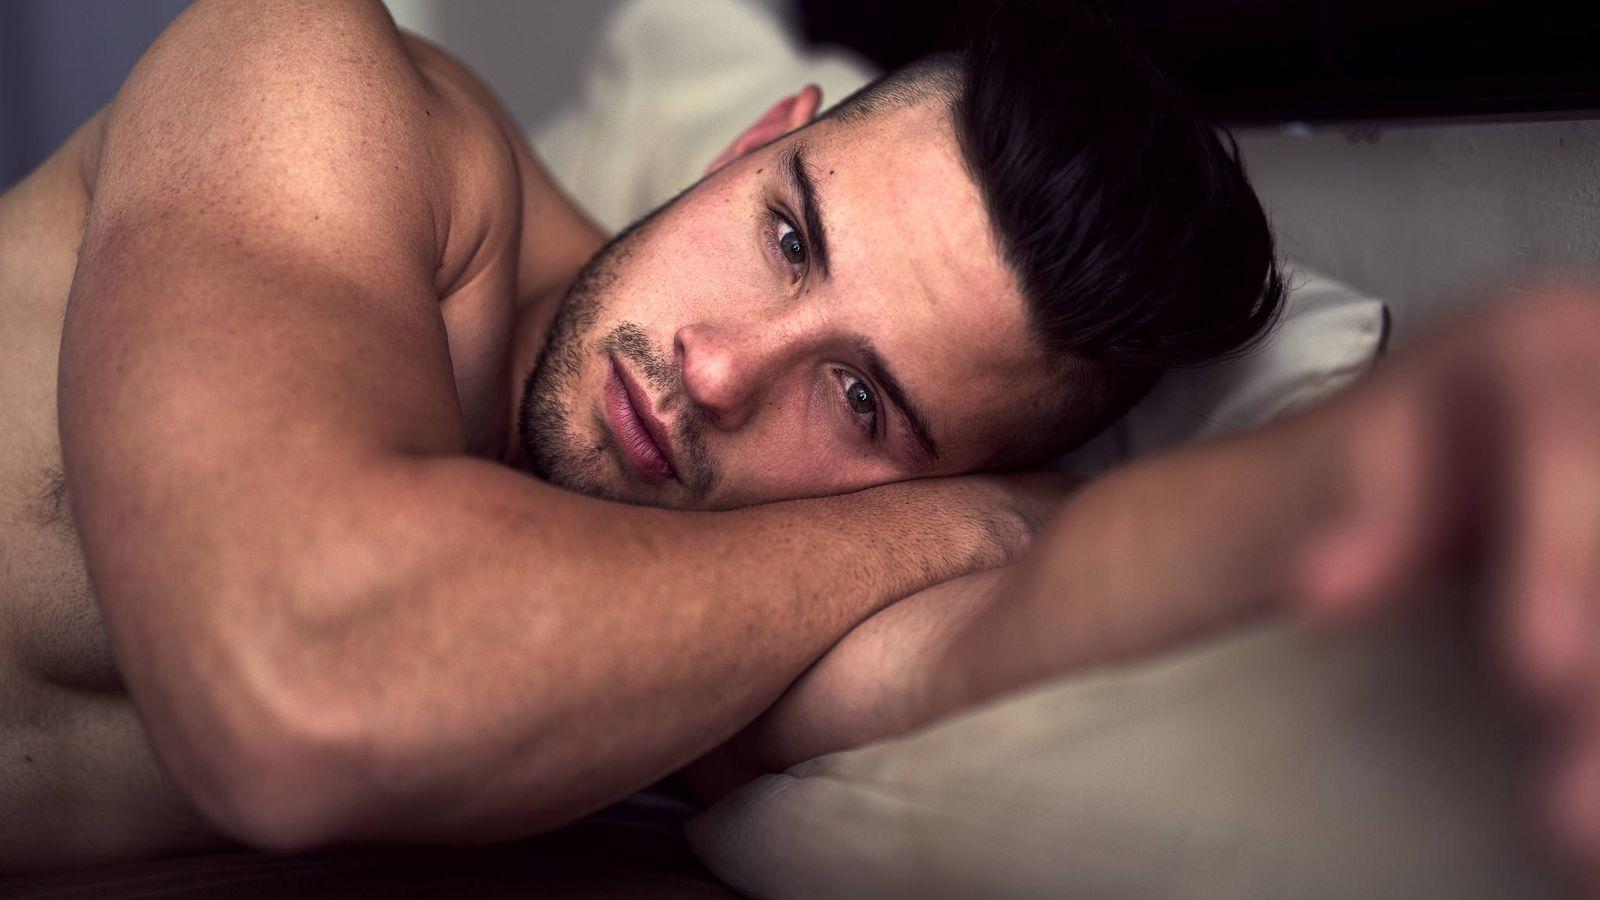 escort gay mallorca paginas de videos porno